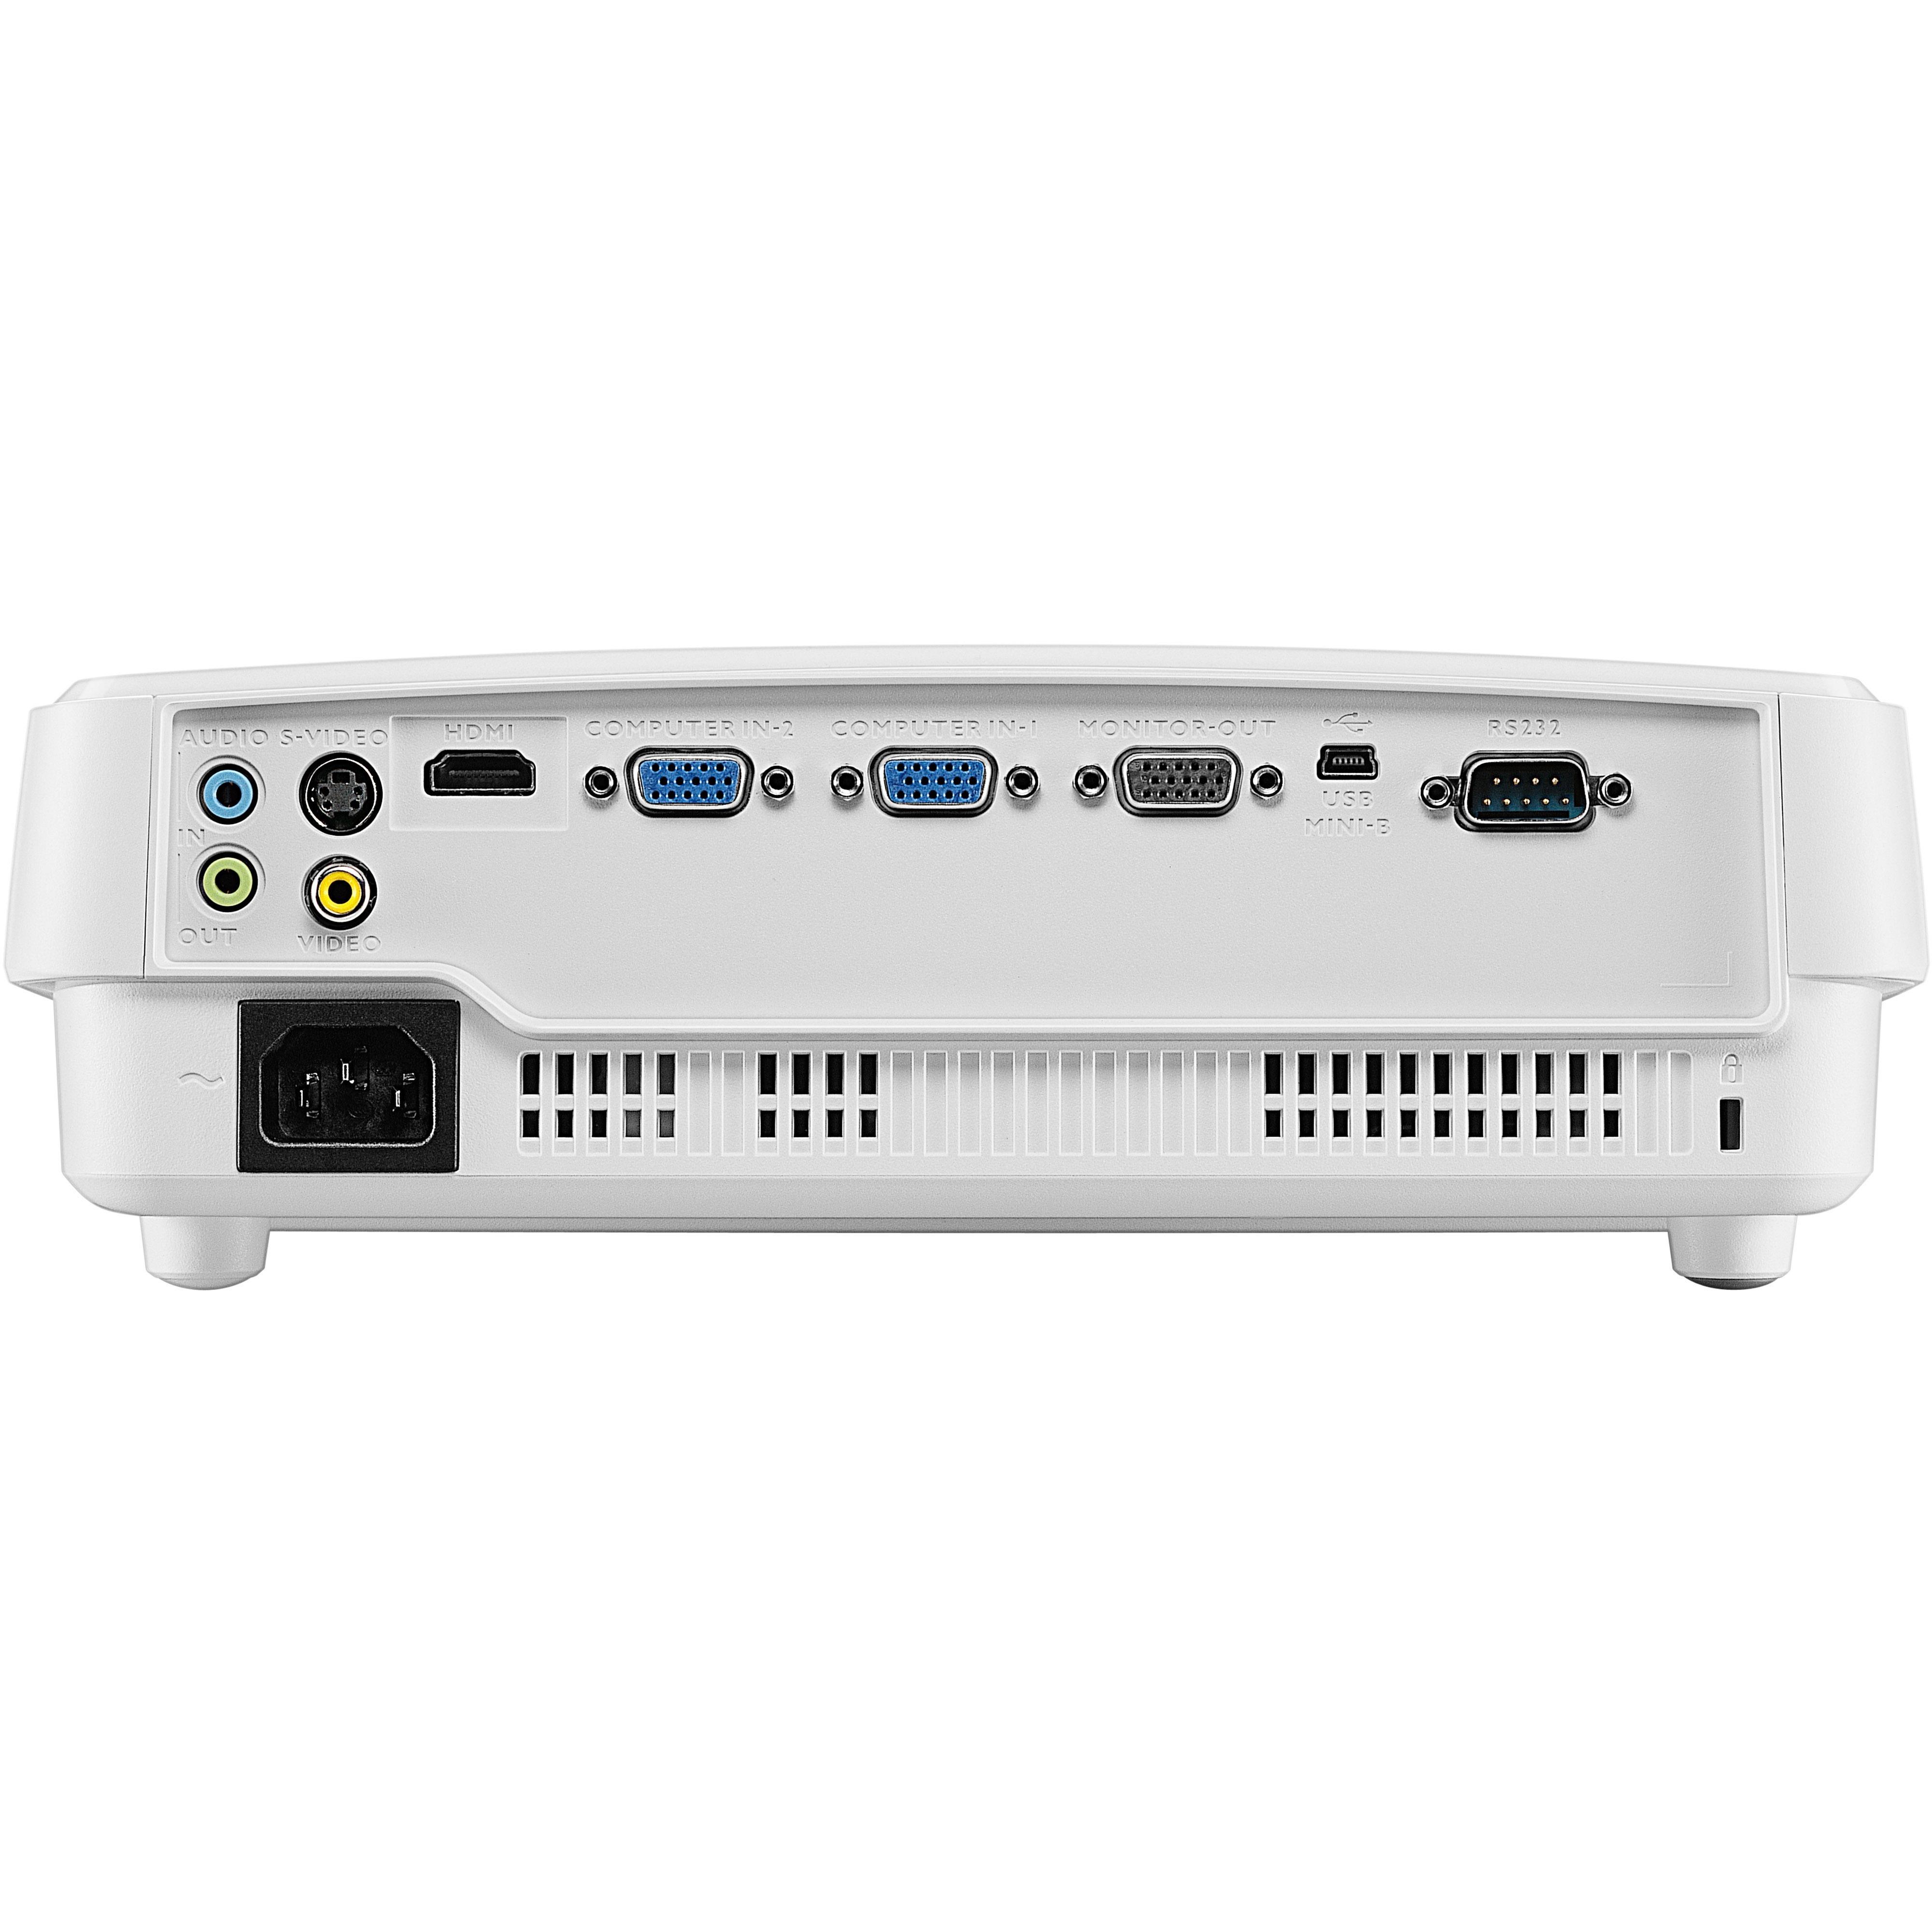 BenQ MS527 3D Ready DLP Projector - 4:3